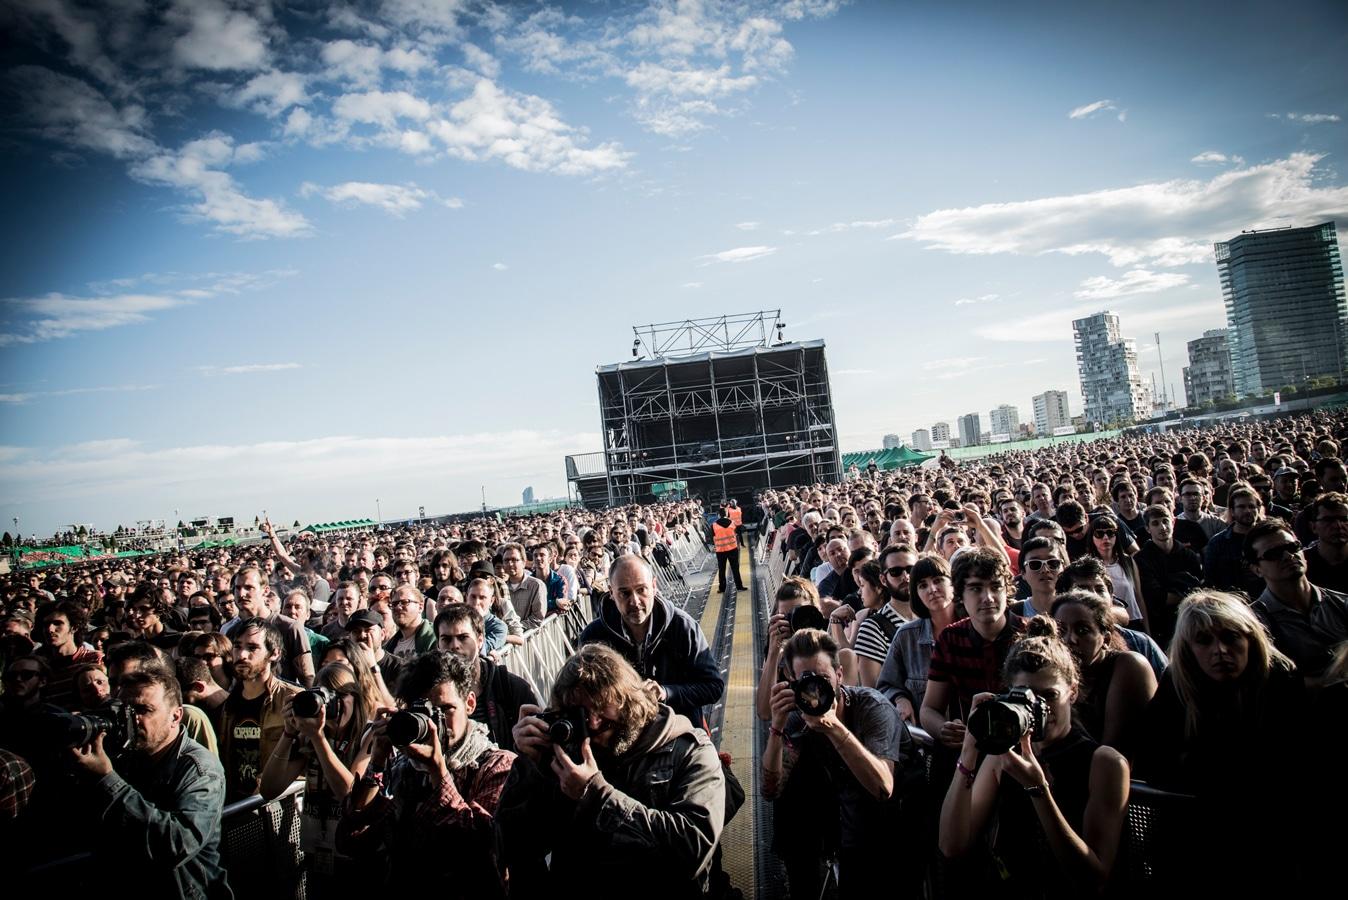 О летних европейских фестивалях:  Primavera Sound 2014. Барселона. Испания